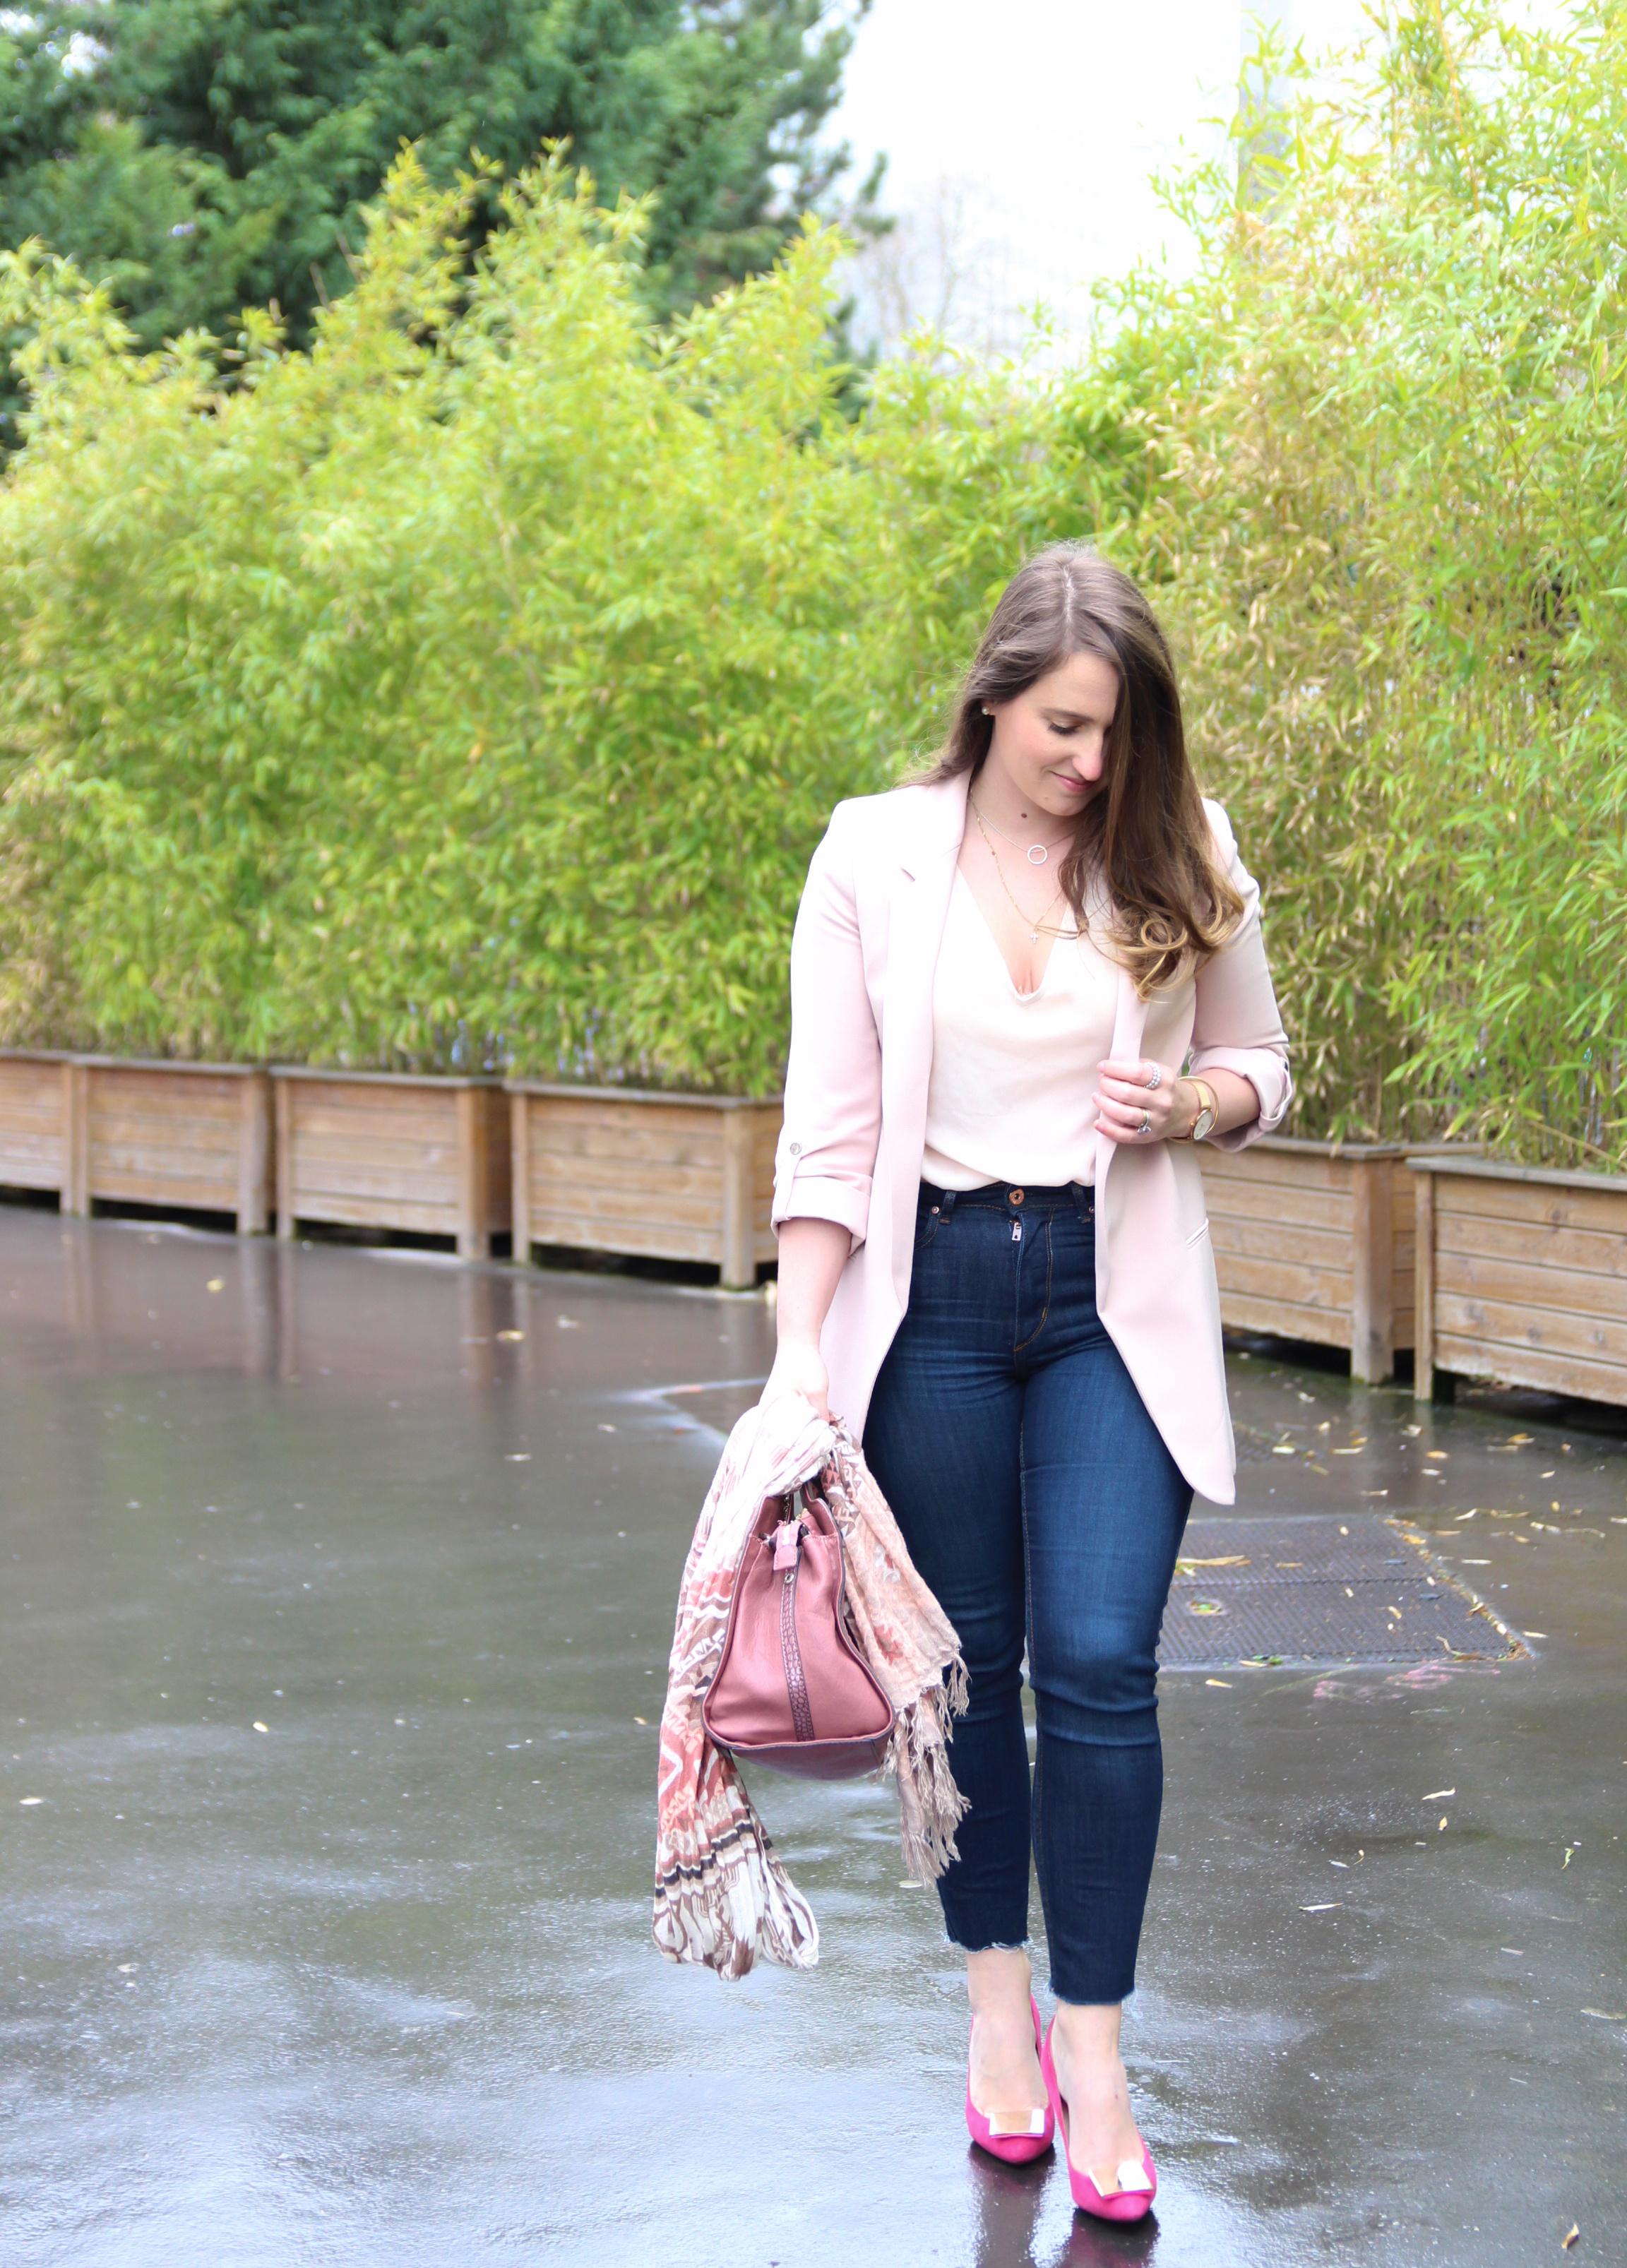 fashionblogger-influencer-jacket-zara-rosepastel-paris-seralynepointcom-2017-03-21 115310